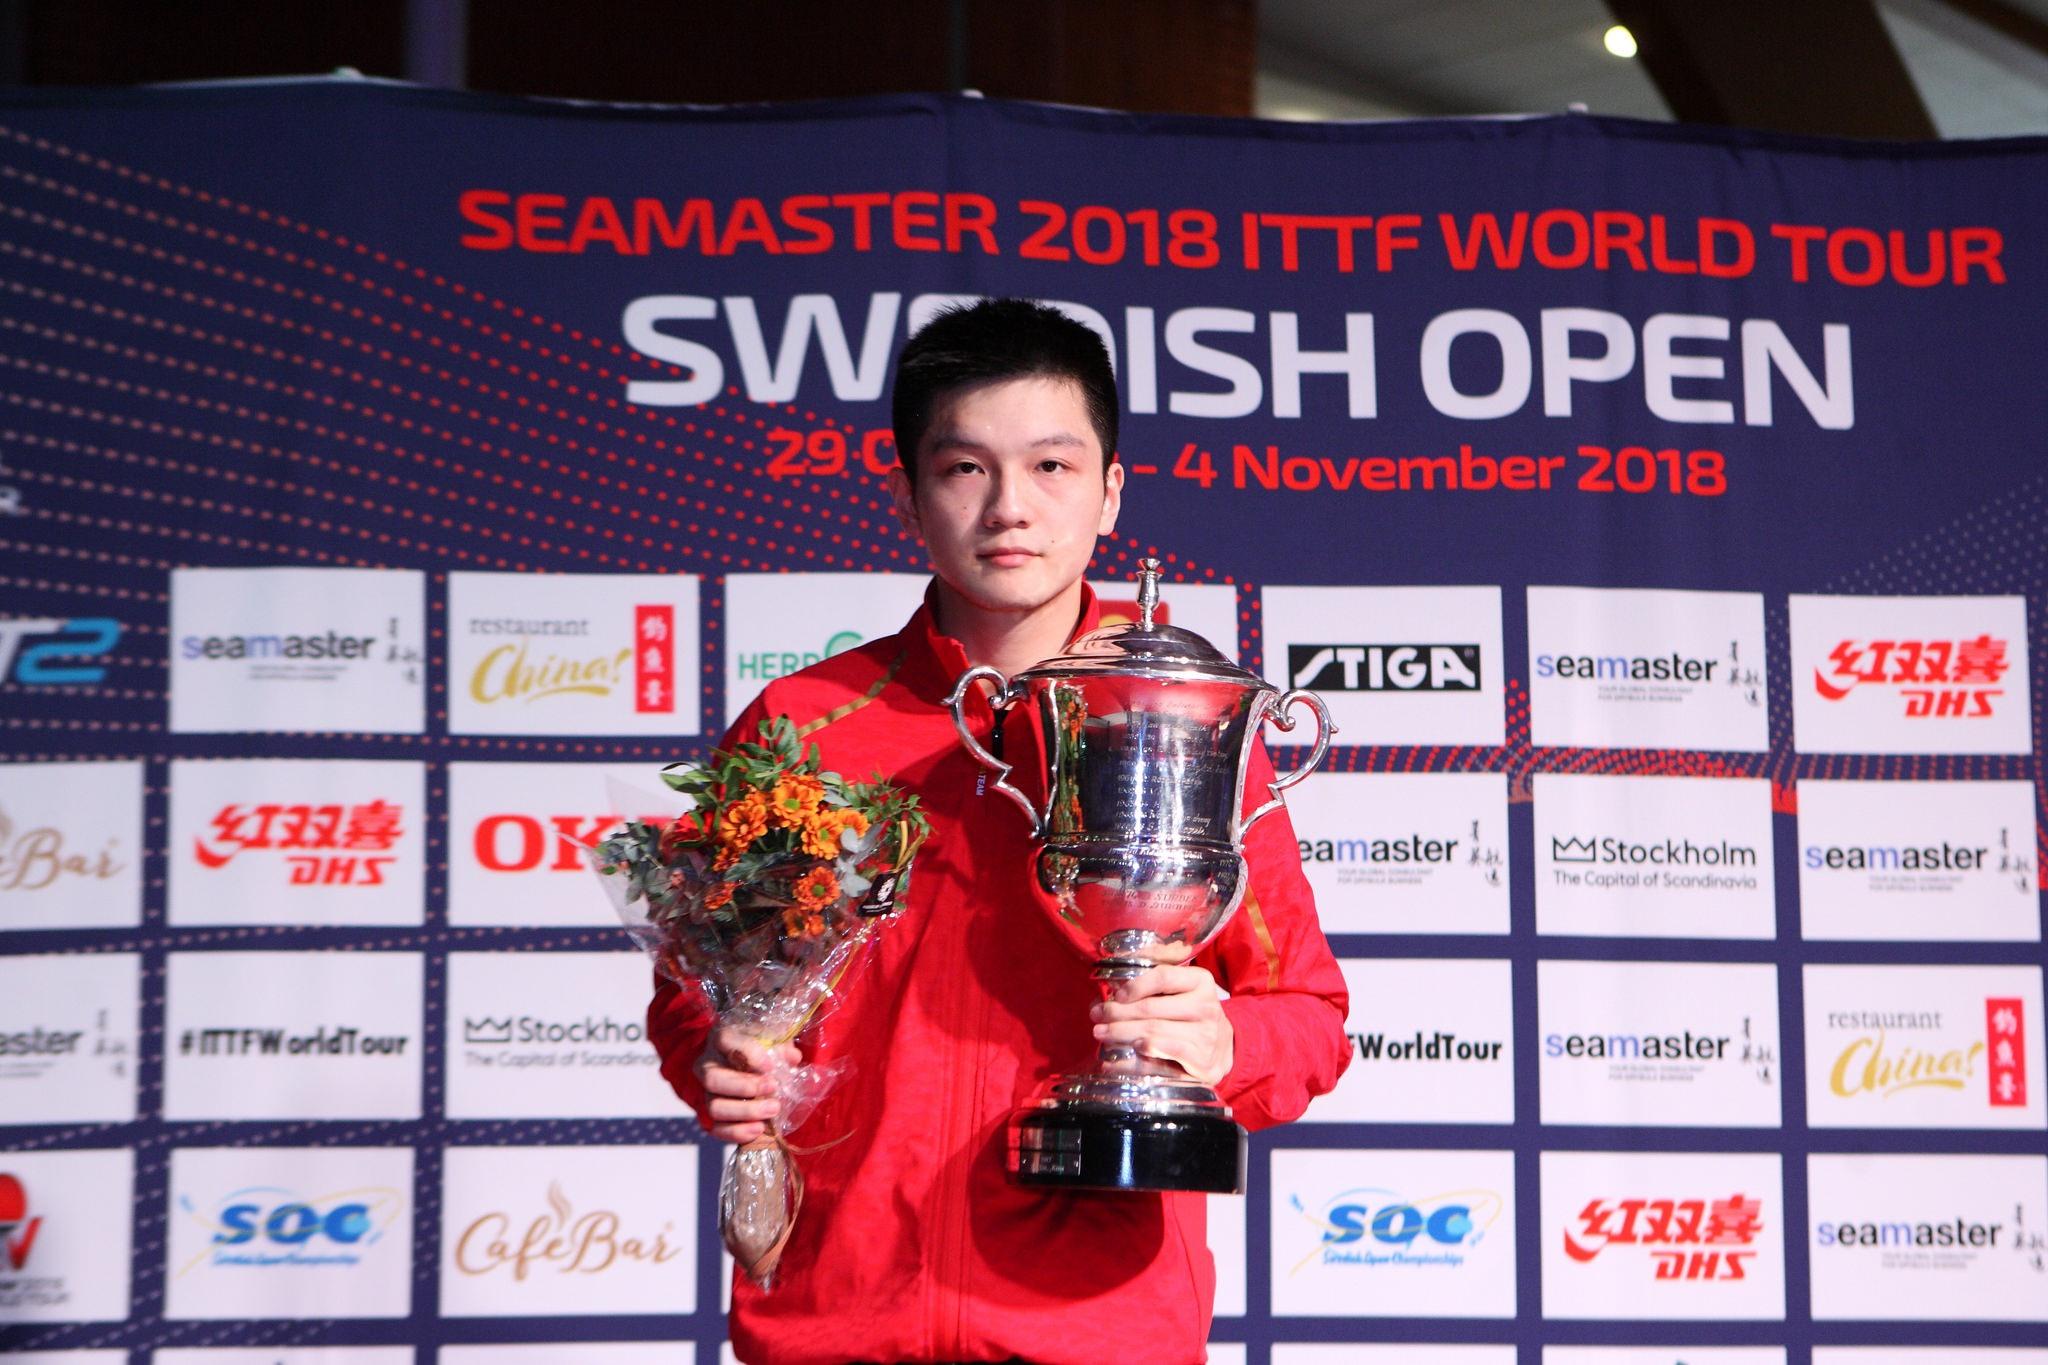 Seamaster ITTF World Tour Swedish Open